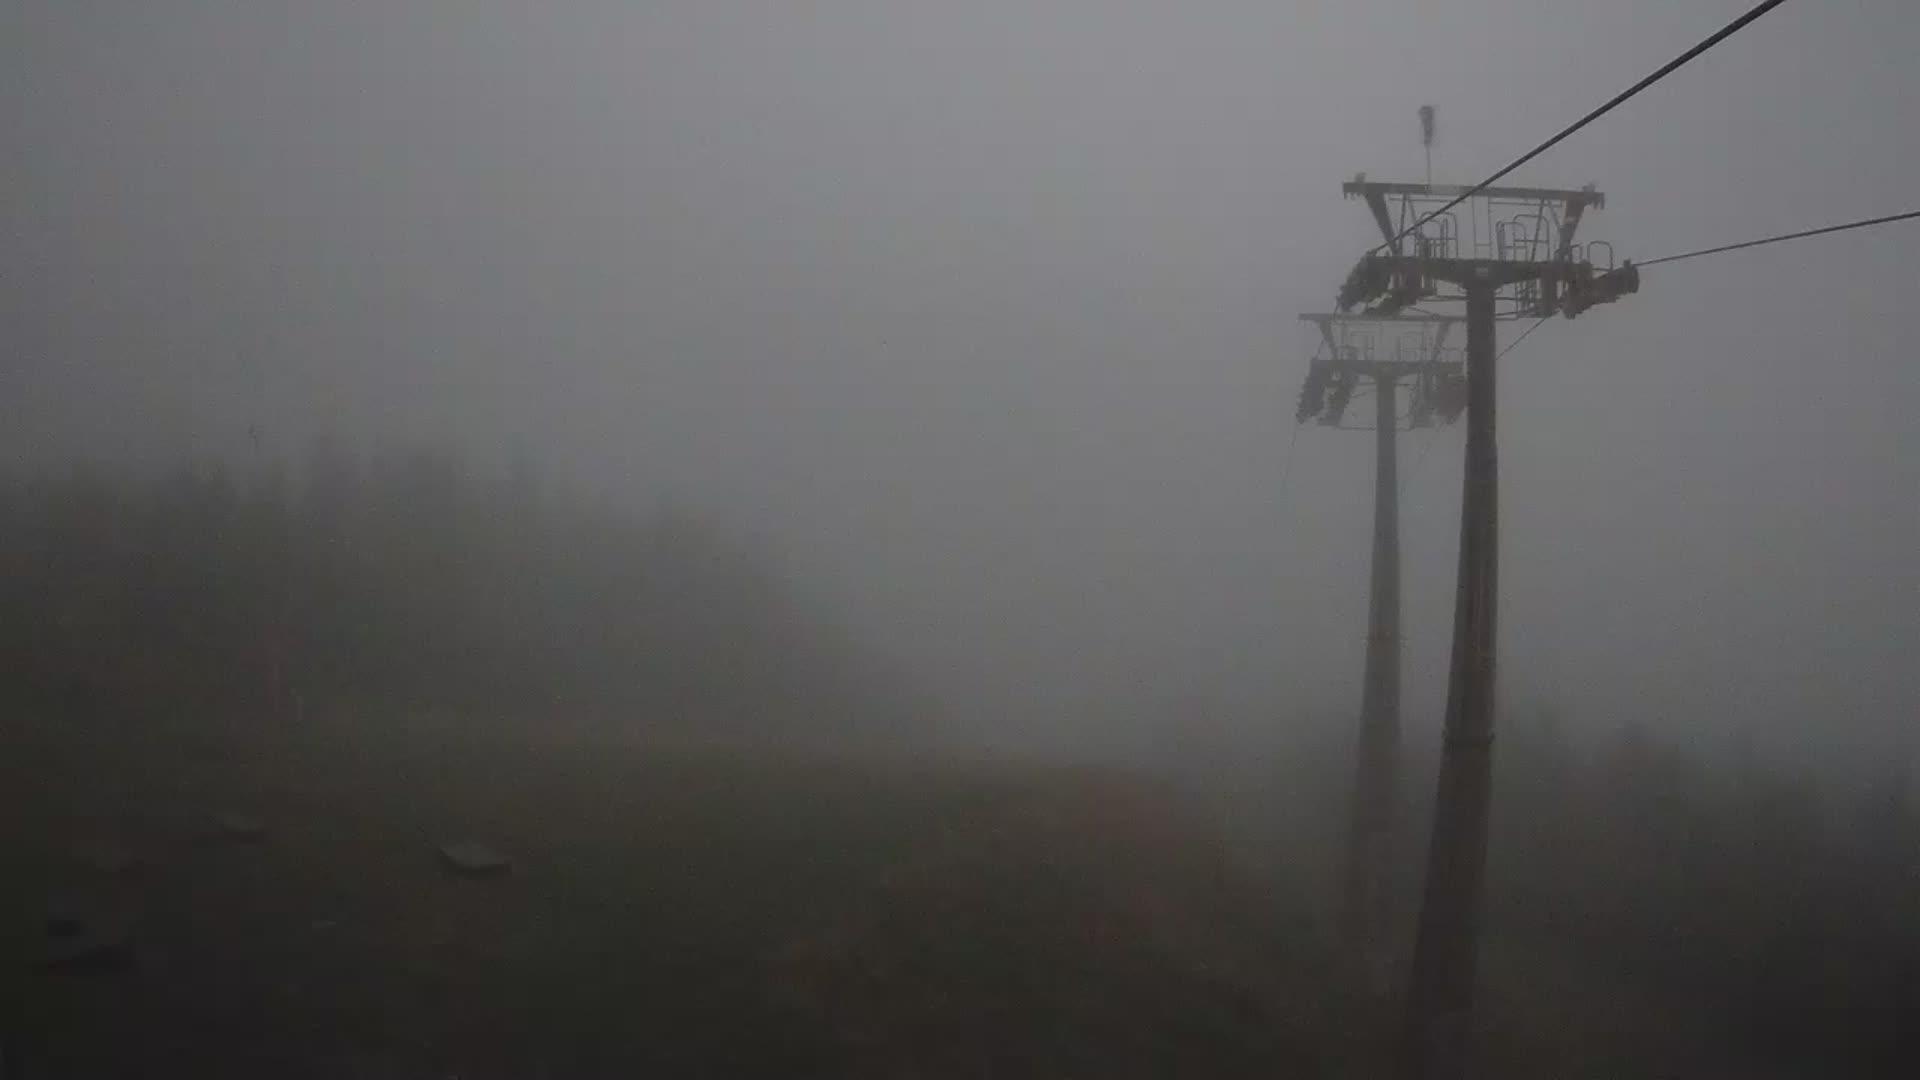 Webcam Skigebiet Swieradow Zdroj cam 2 - Isergebirge